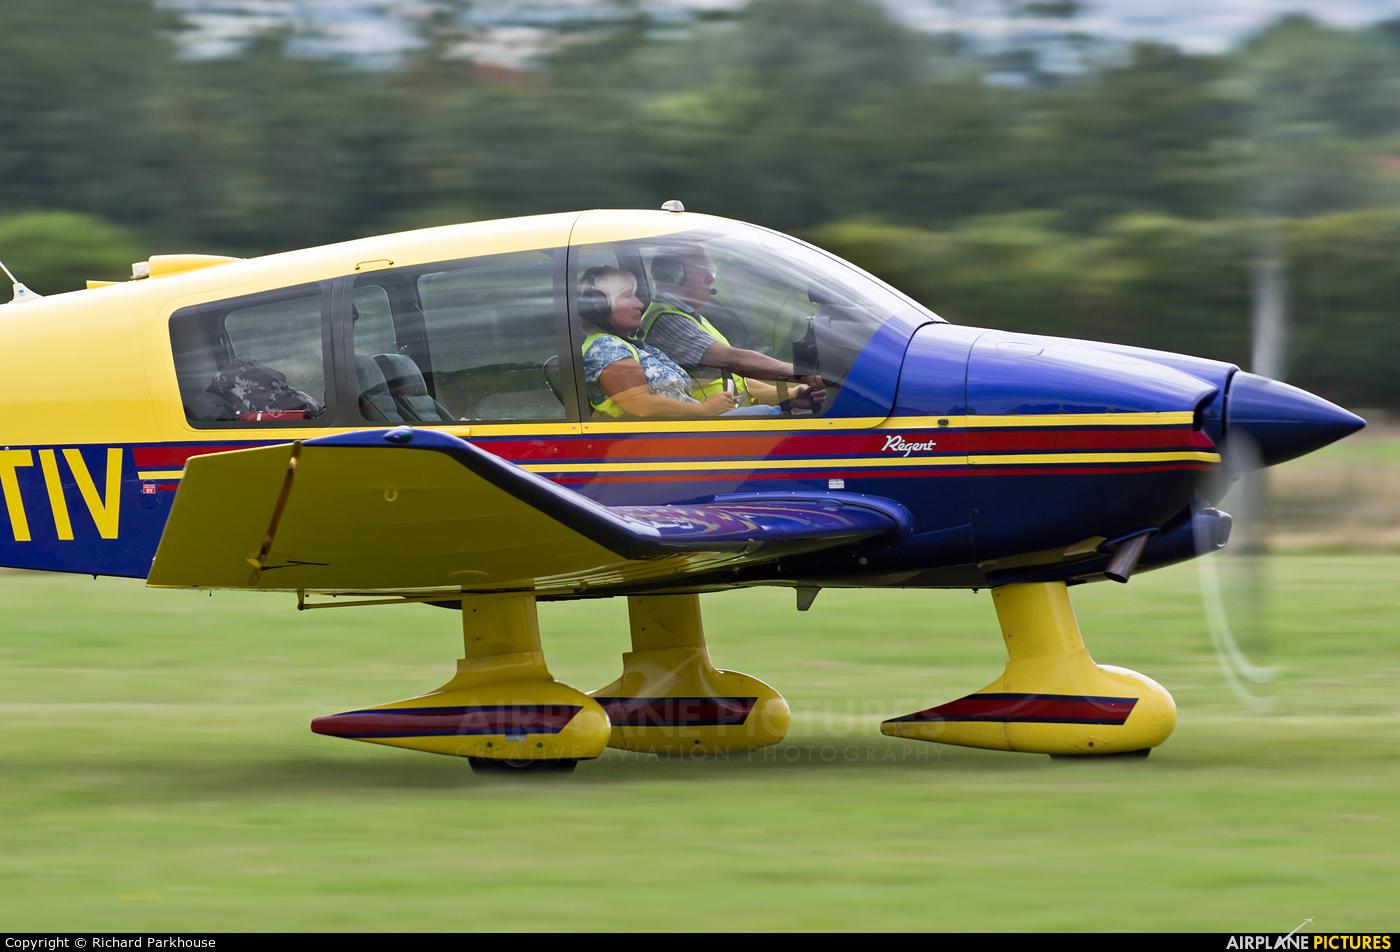 Private G-ETIV aircraft at Lashenden / Headcorn